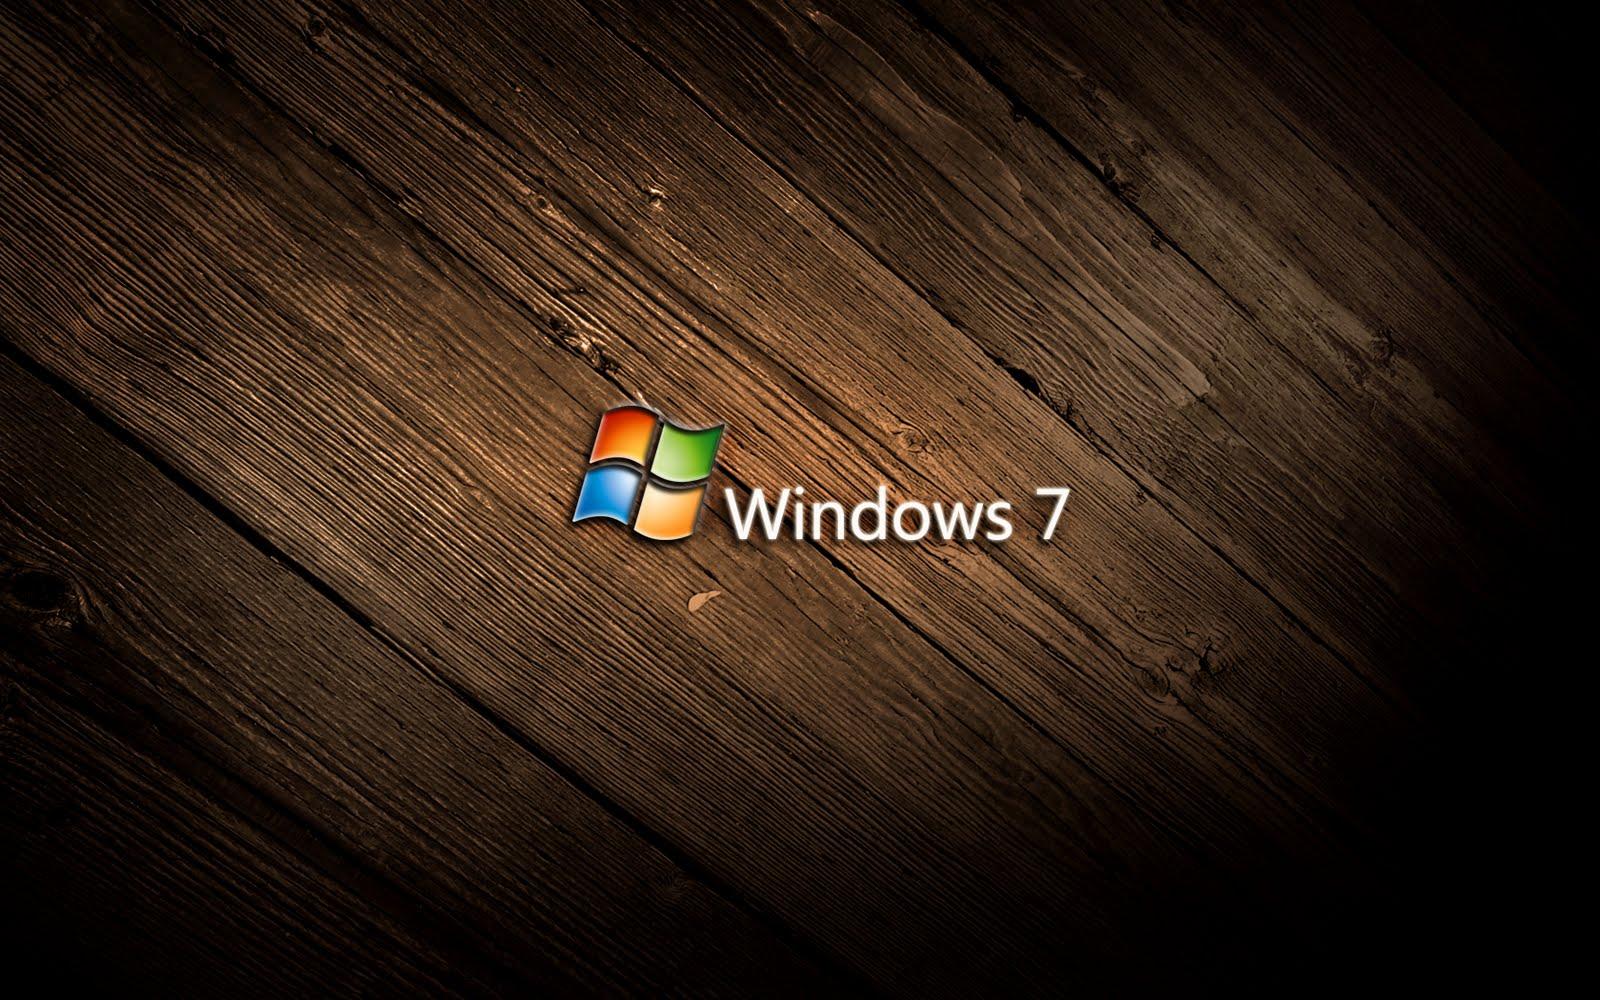 FULL WALLPAPER: Window 7 Wallpaper Hd